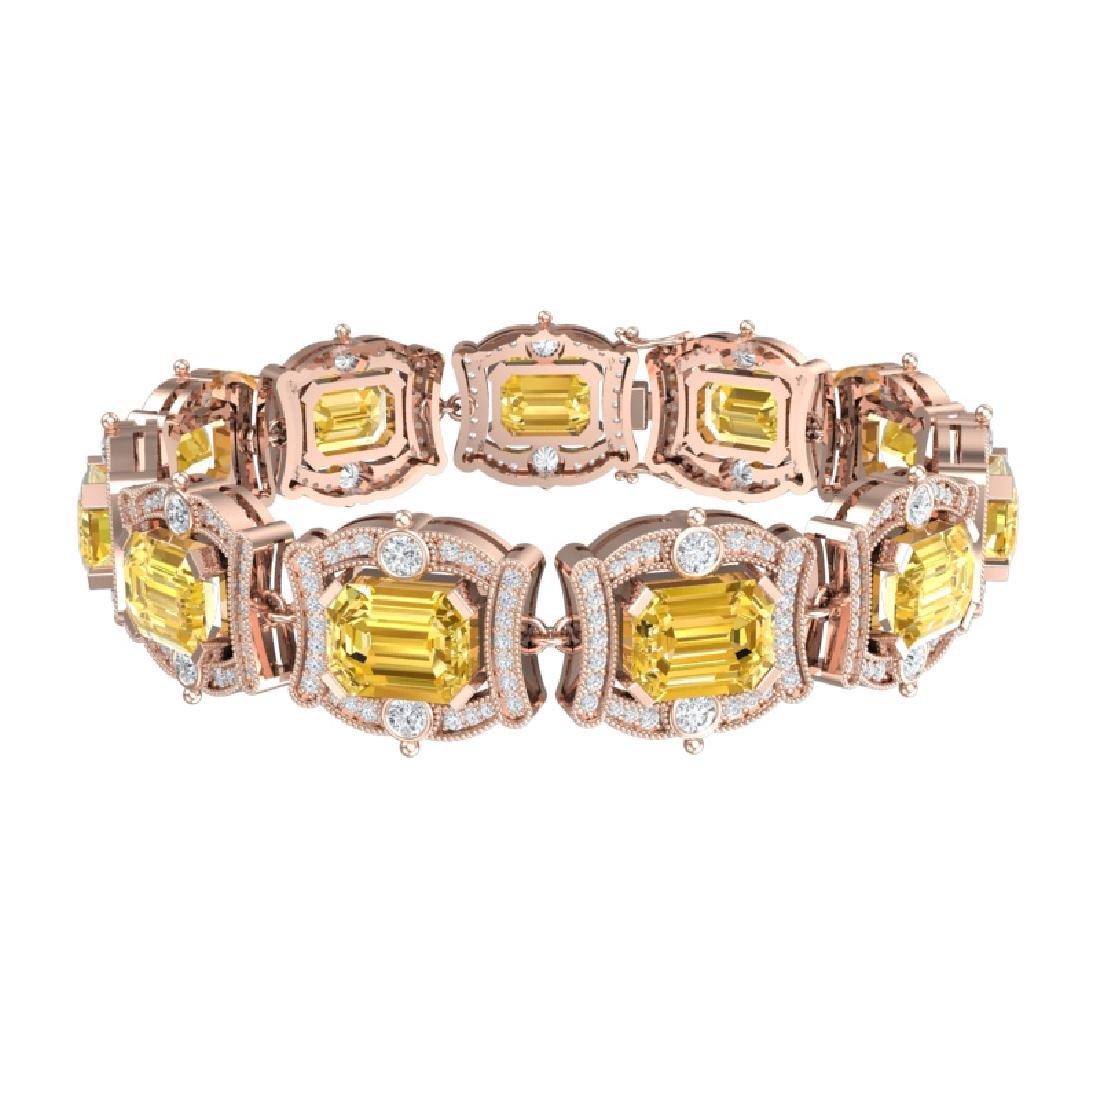 37.15 CTW Royalty Canary Citrine & VS Diamond Bracelet - 3